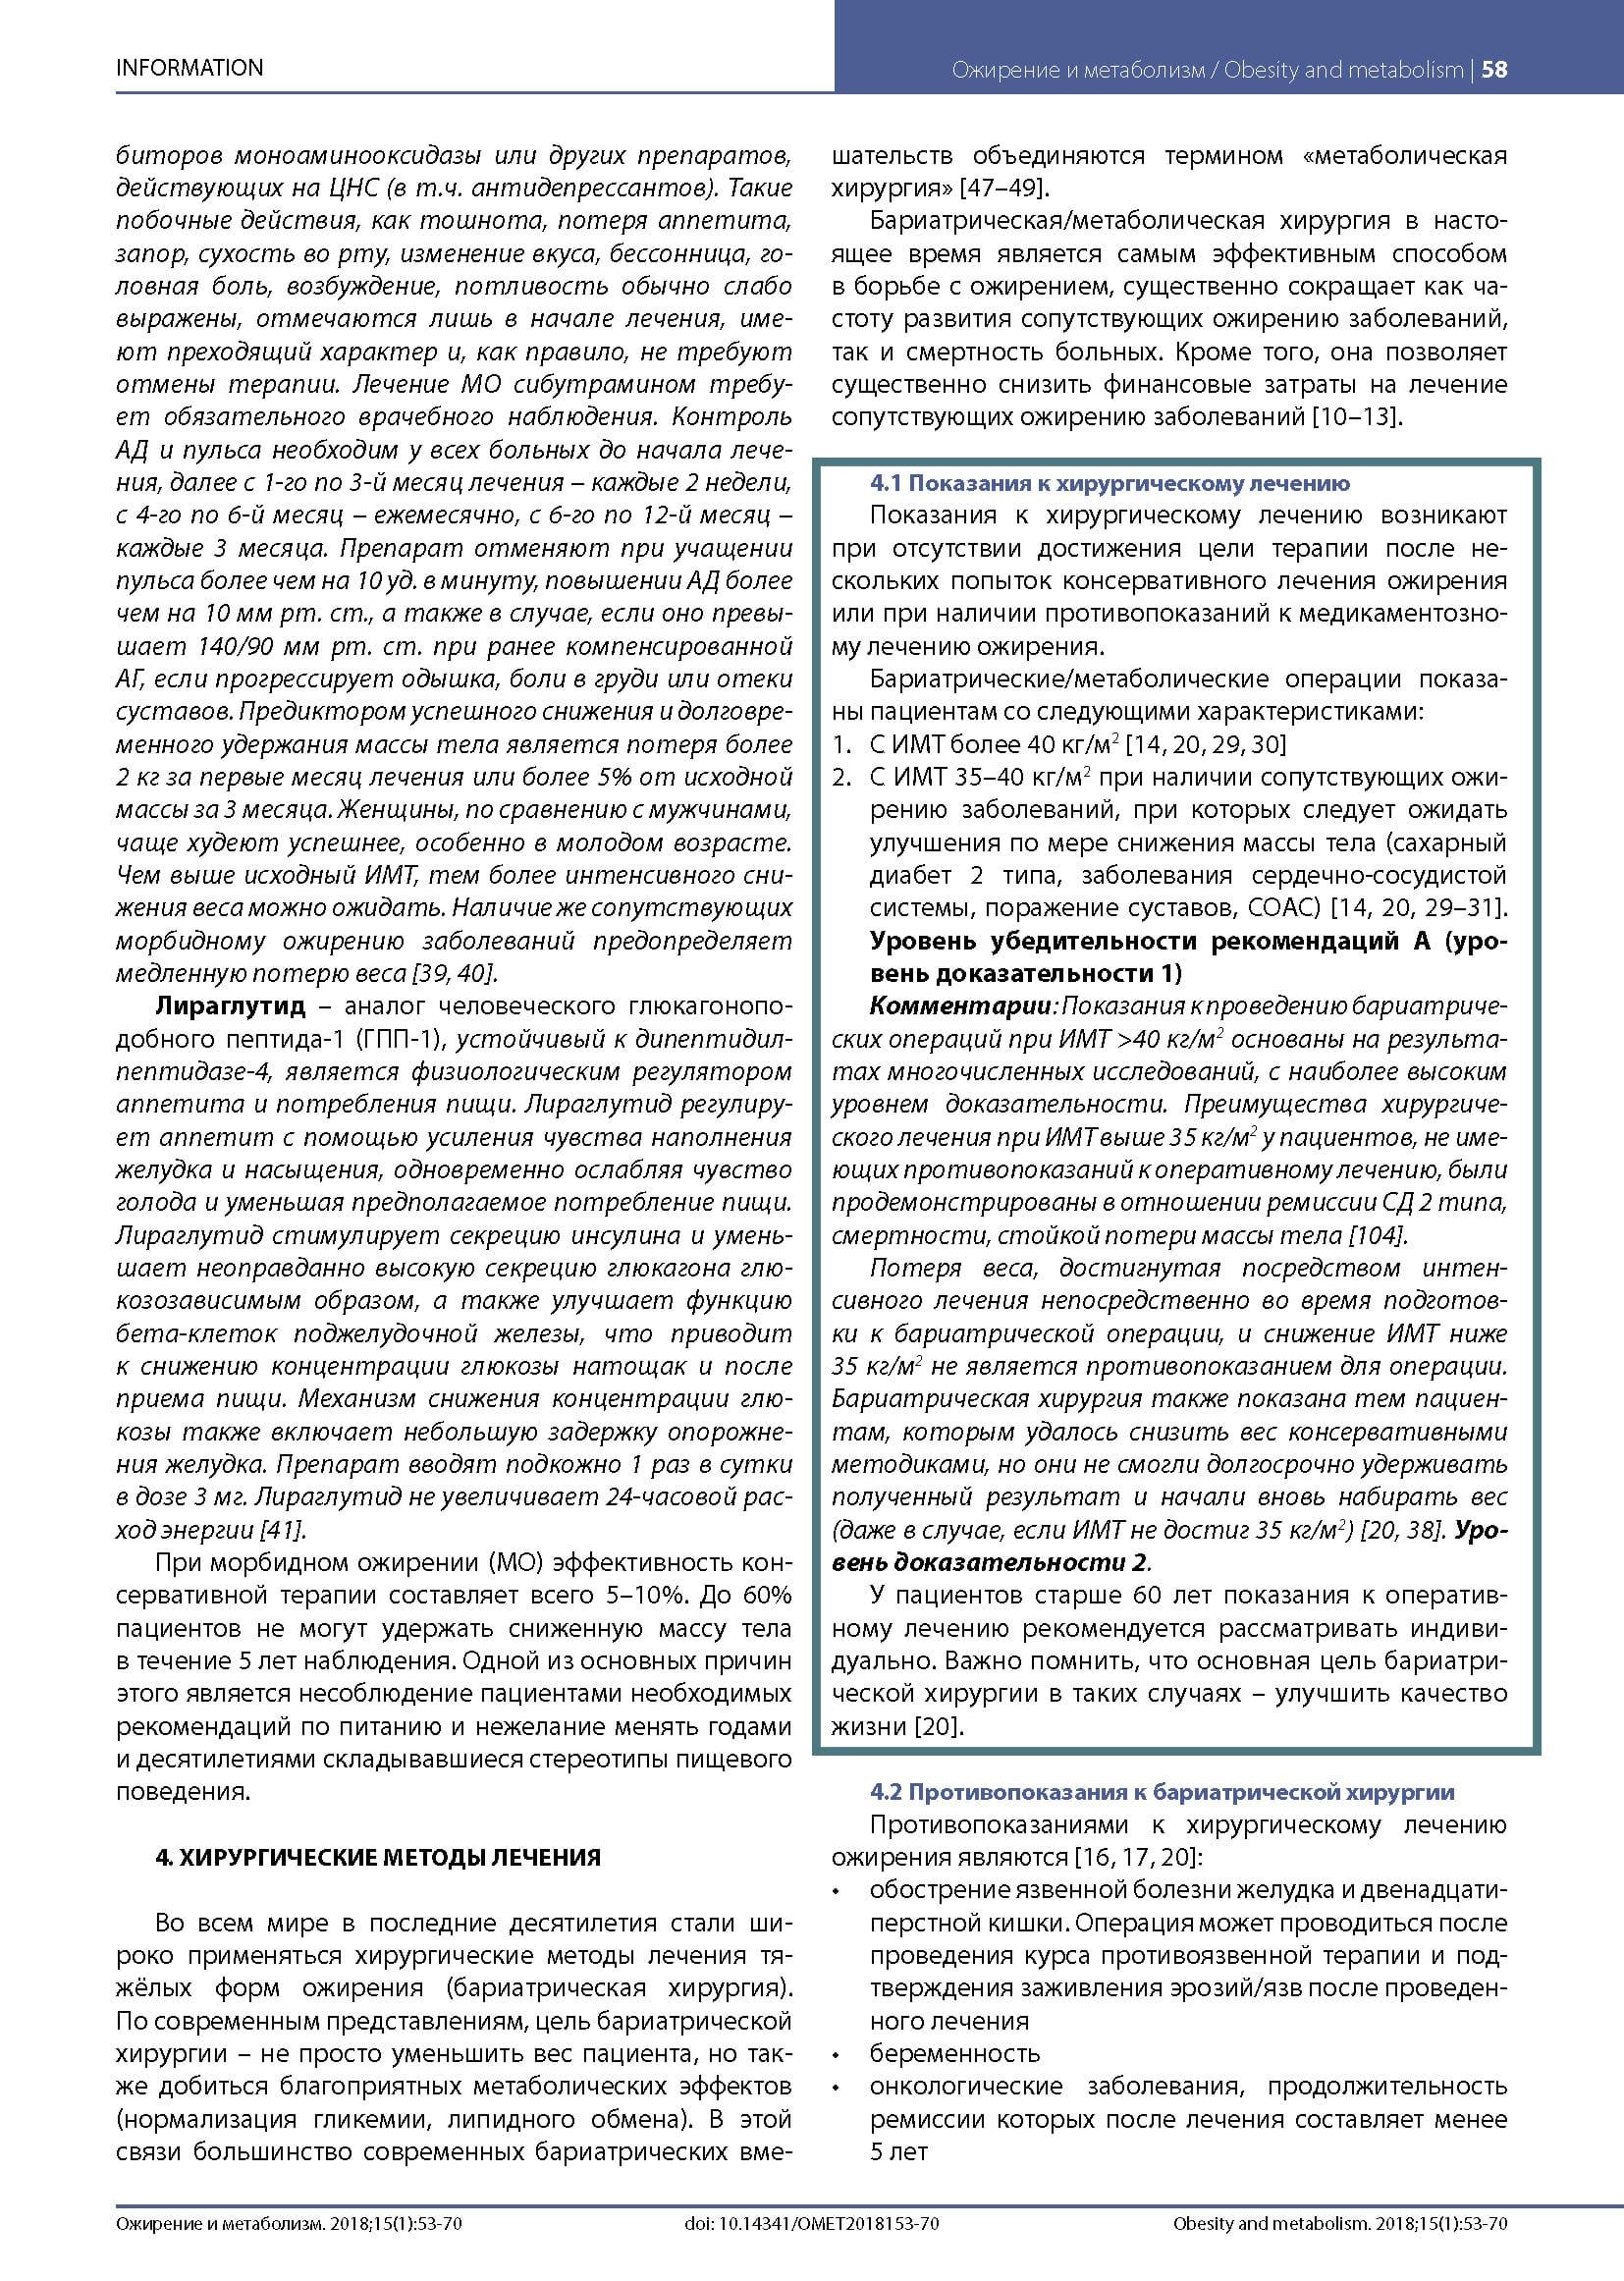 Рекомендации бариатрии